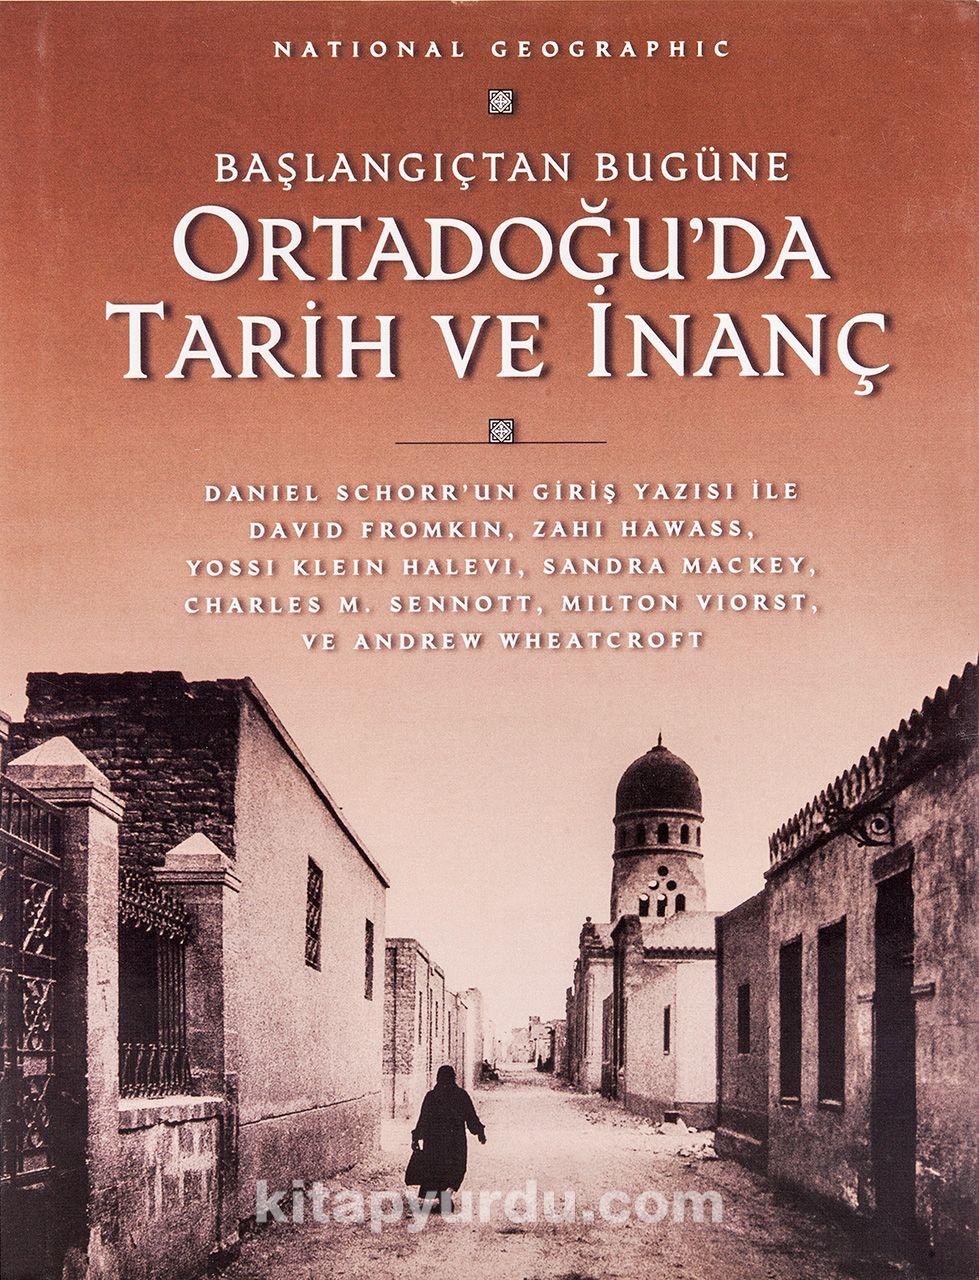 Ortadoğu'da Tarih ve İnanç